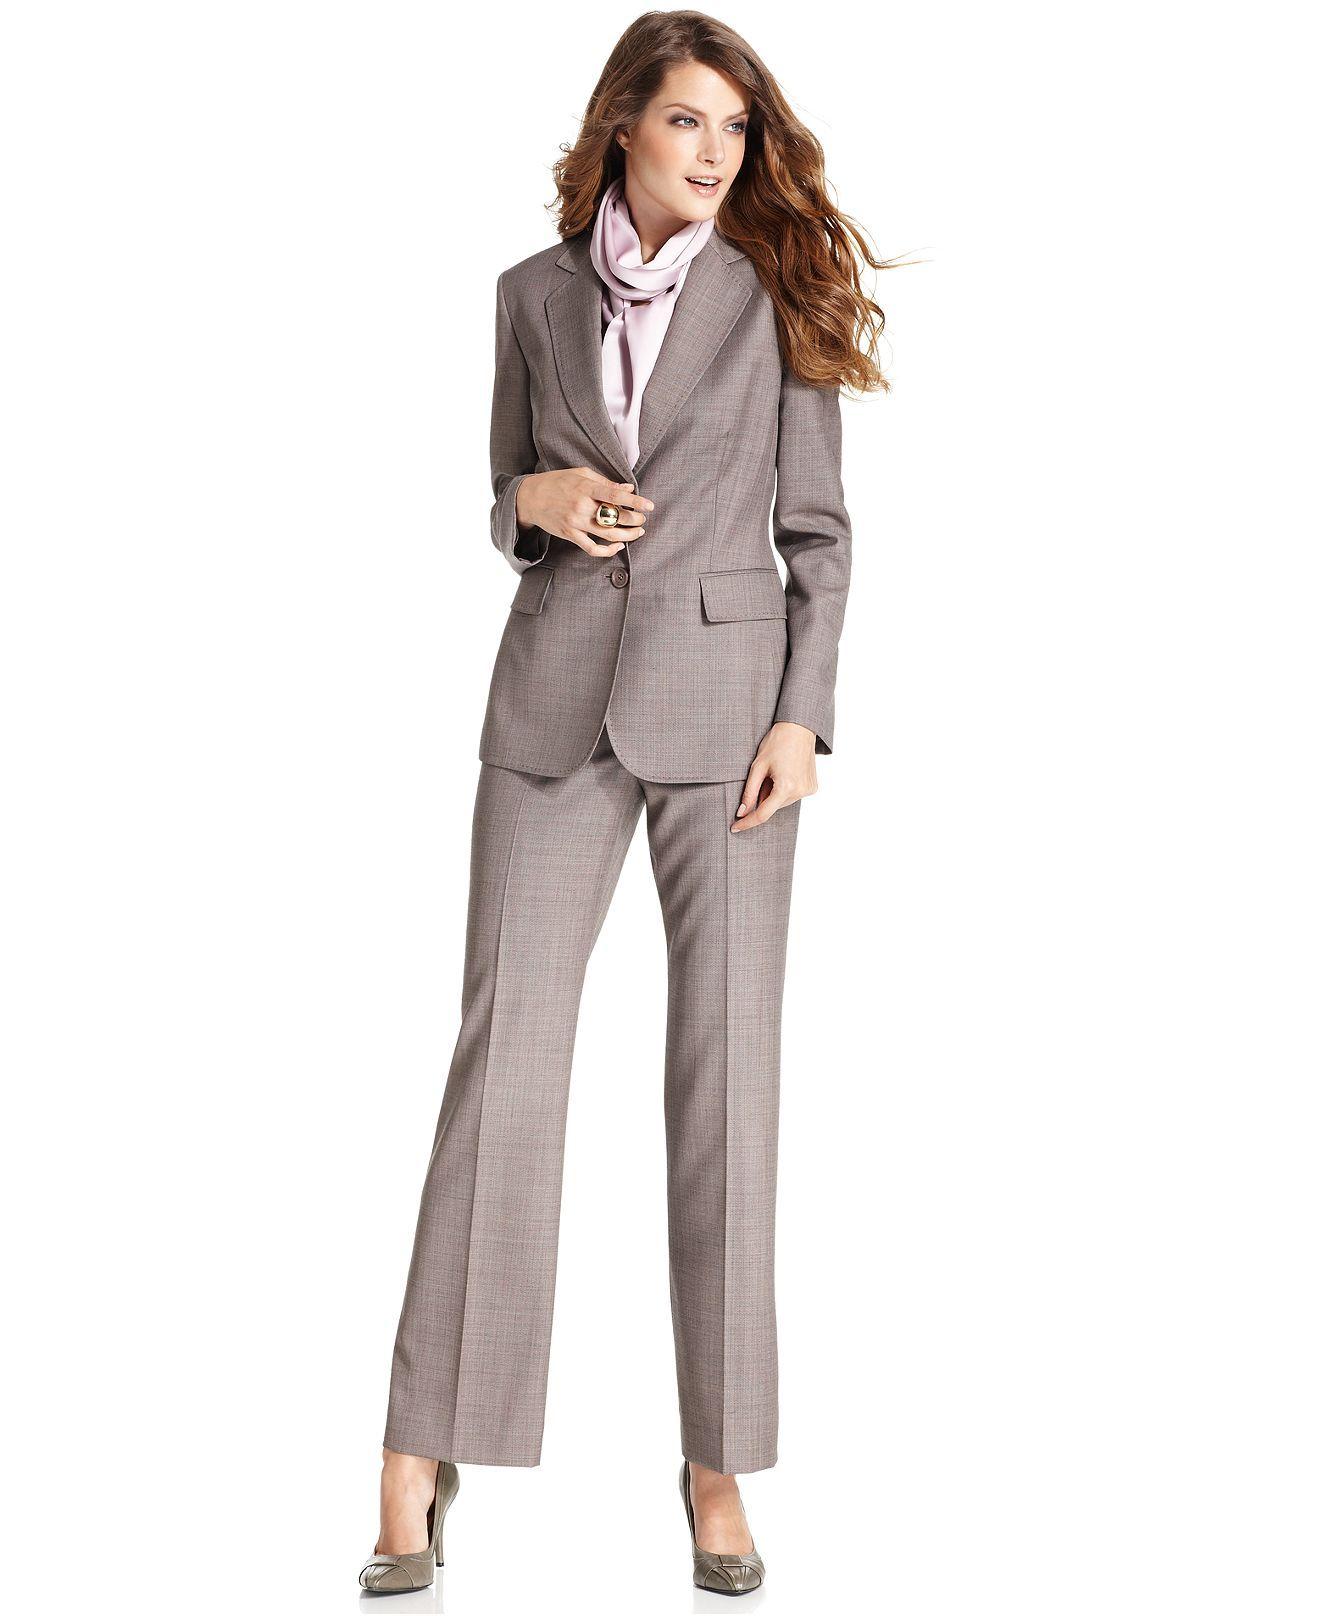 Katharine suit idea at Macy's